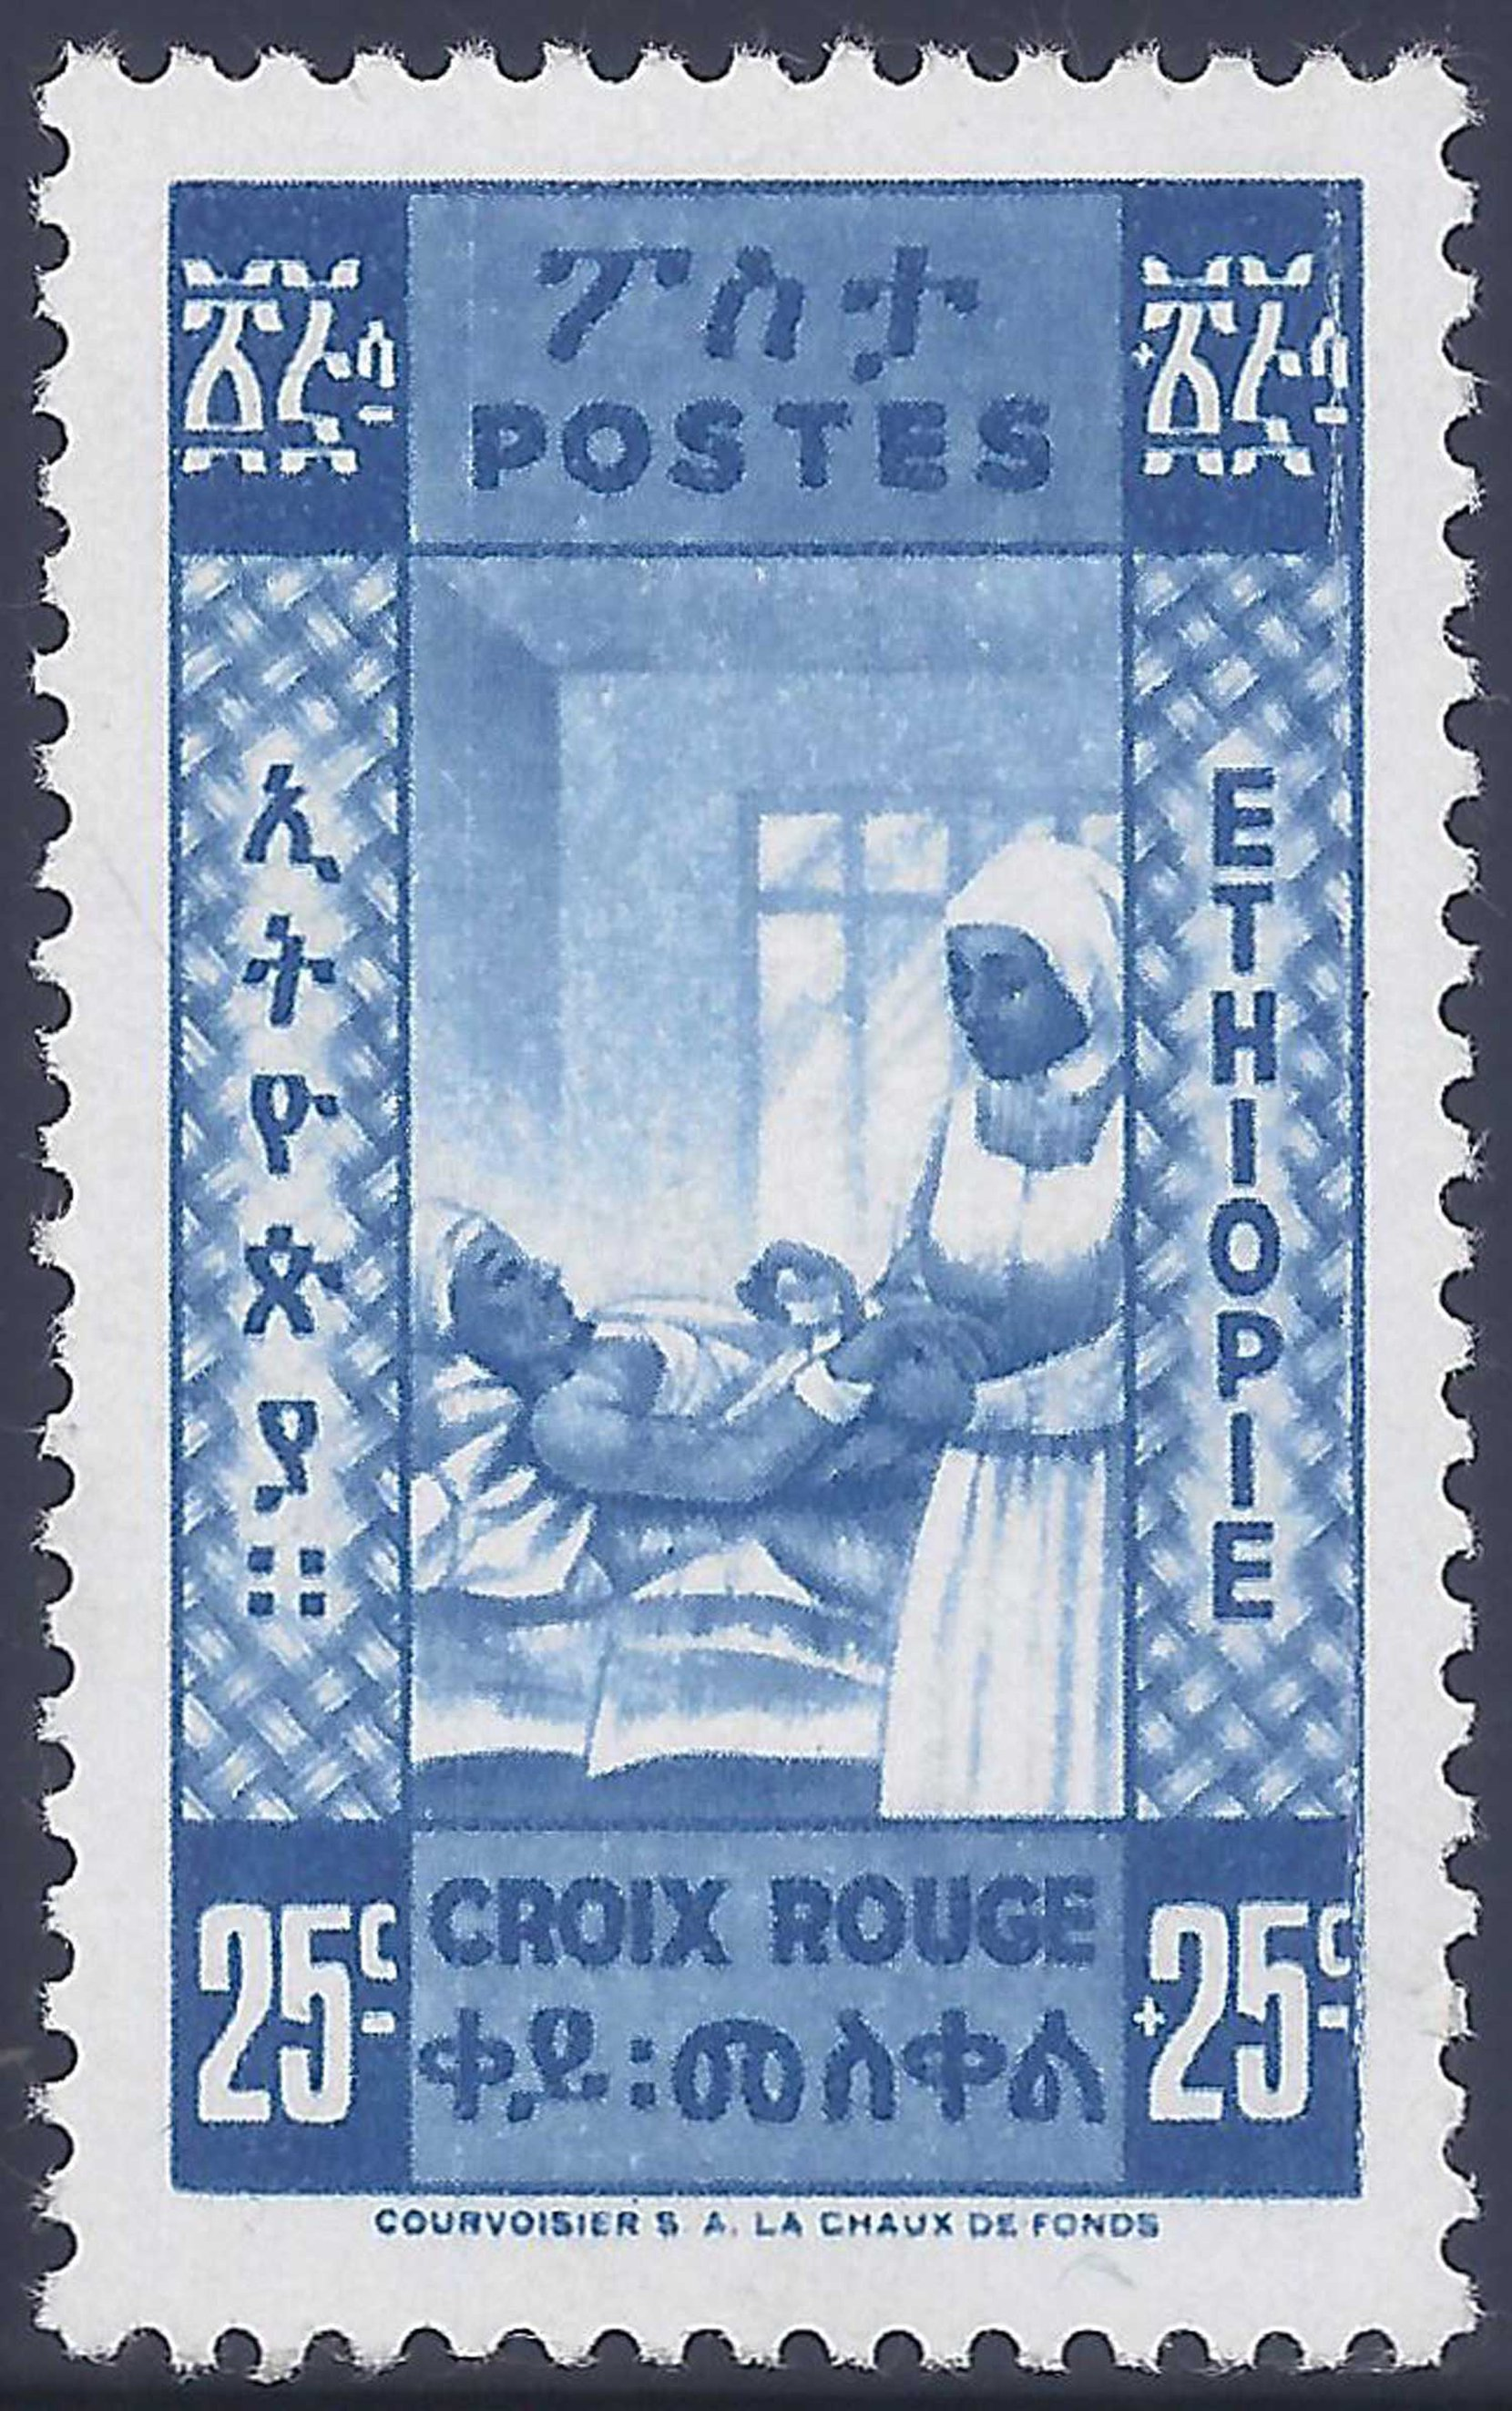 mi#et-iii philately postage stamps